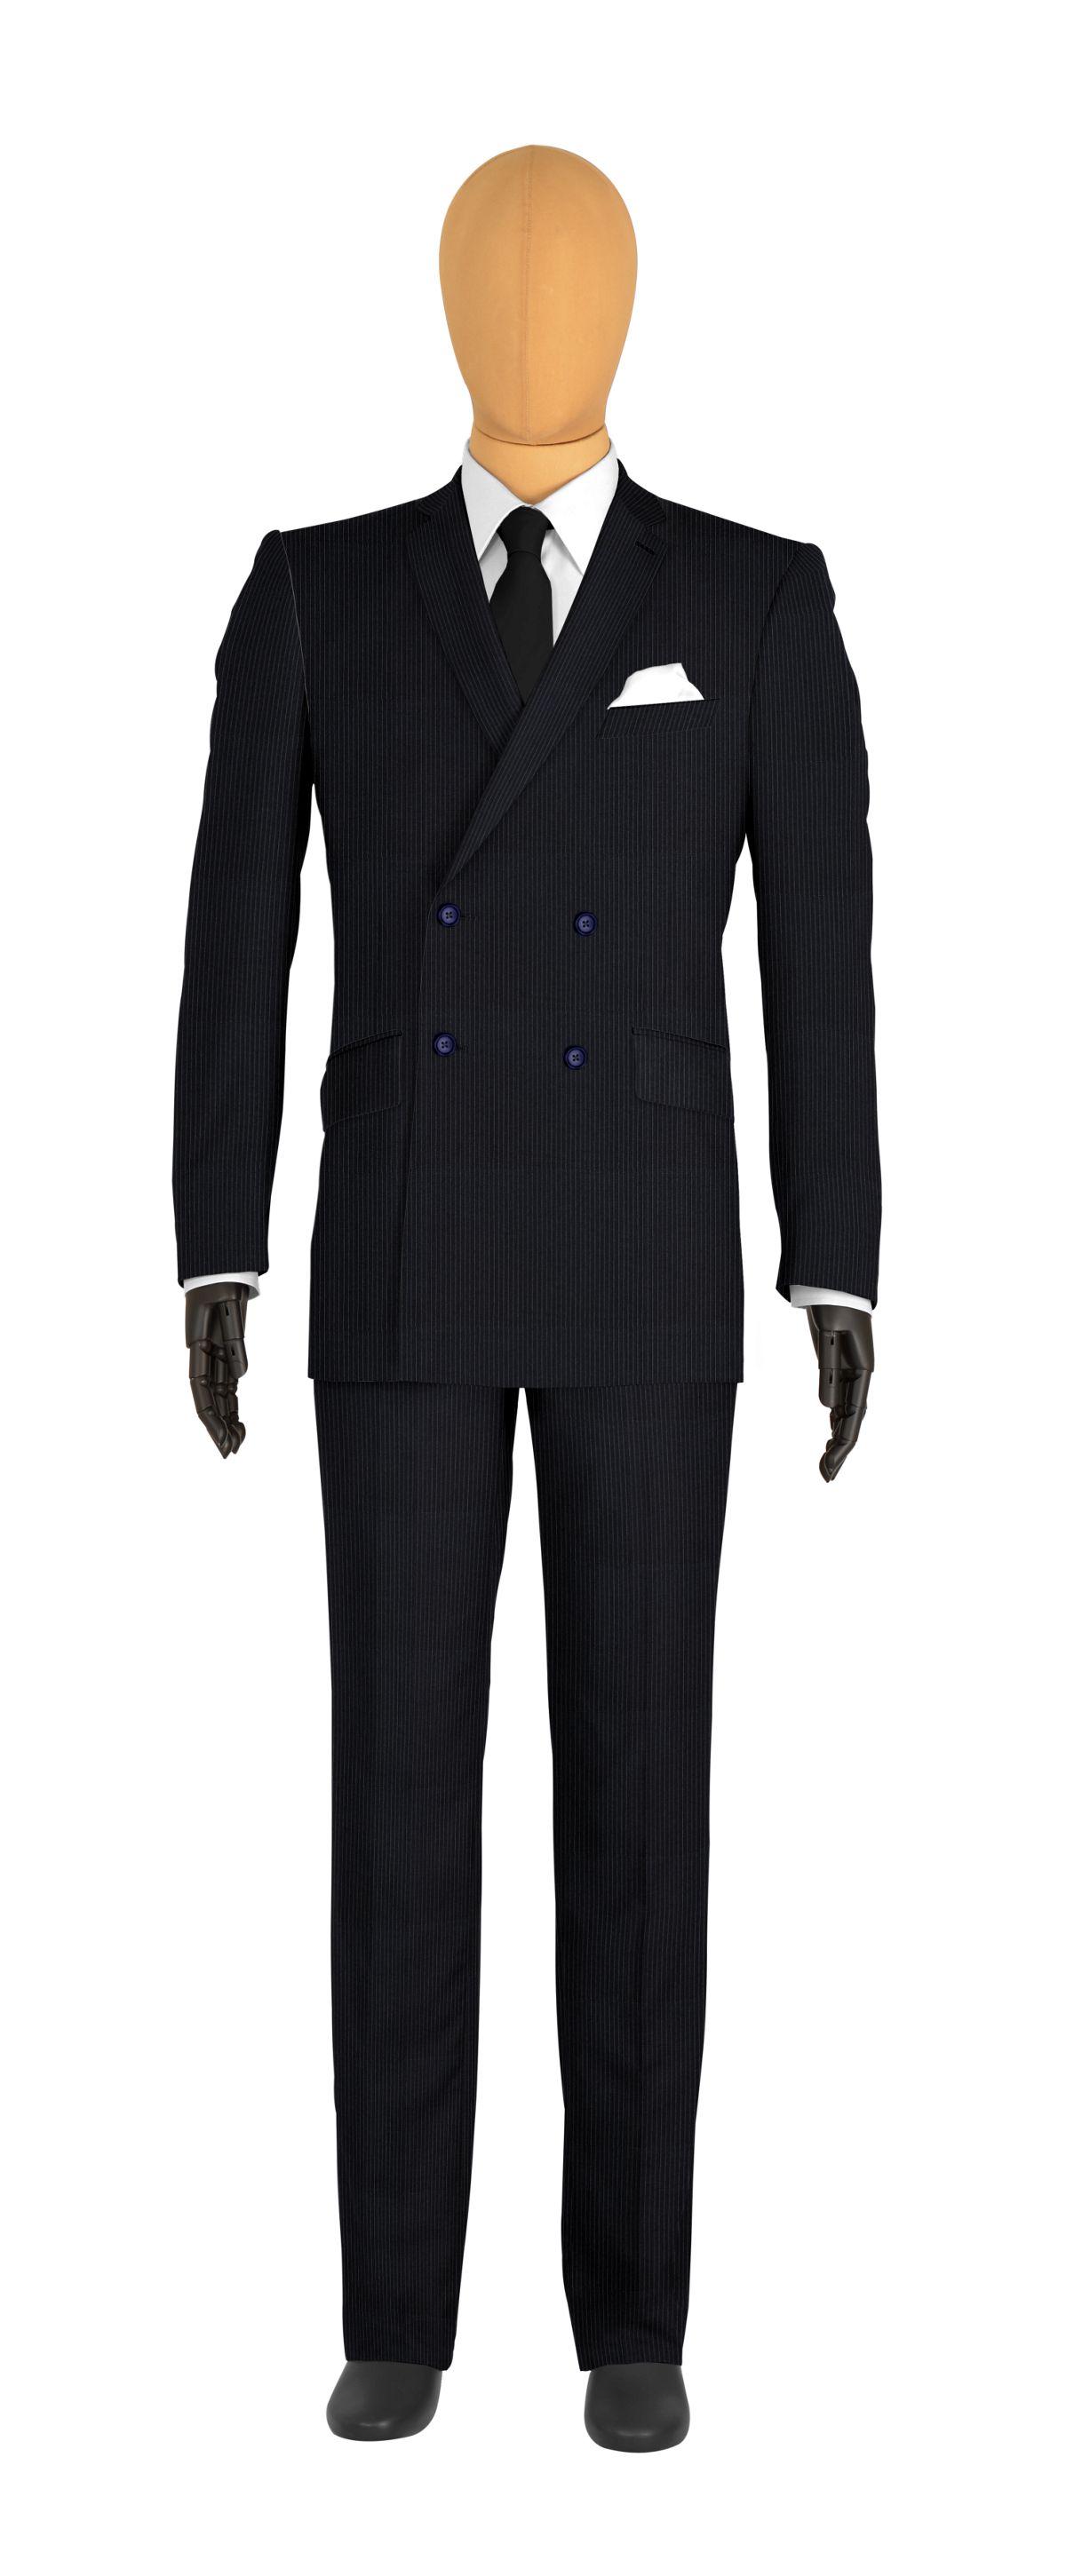 Costume veste croisée bleu rayures fines